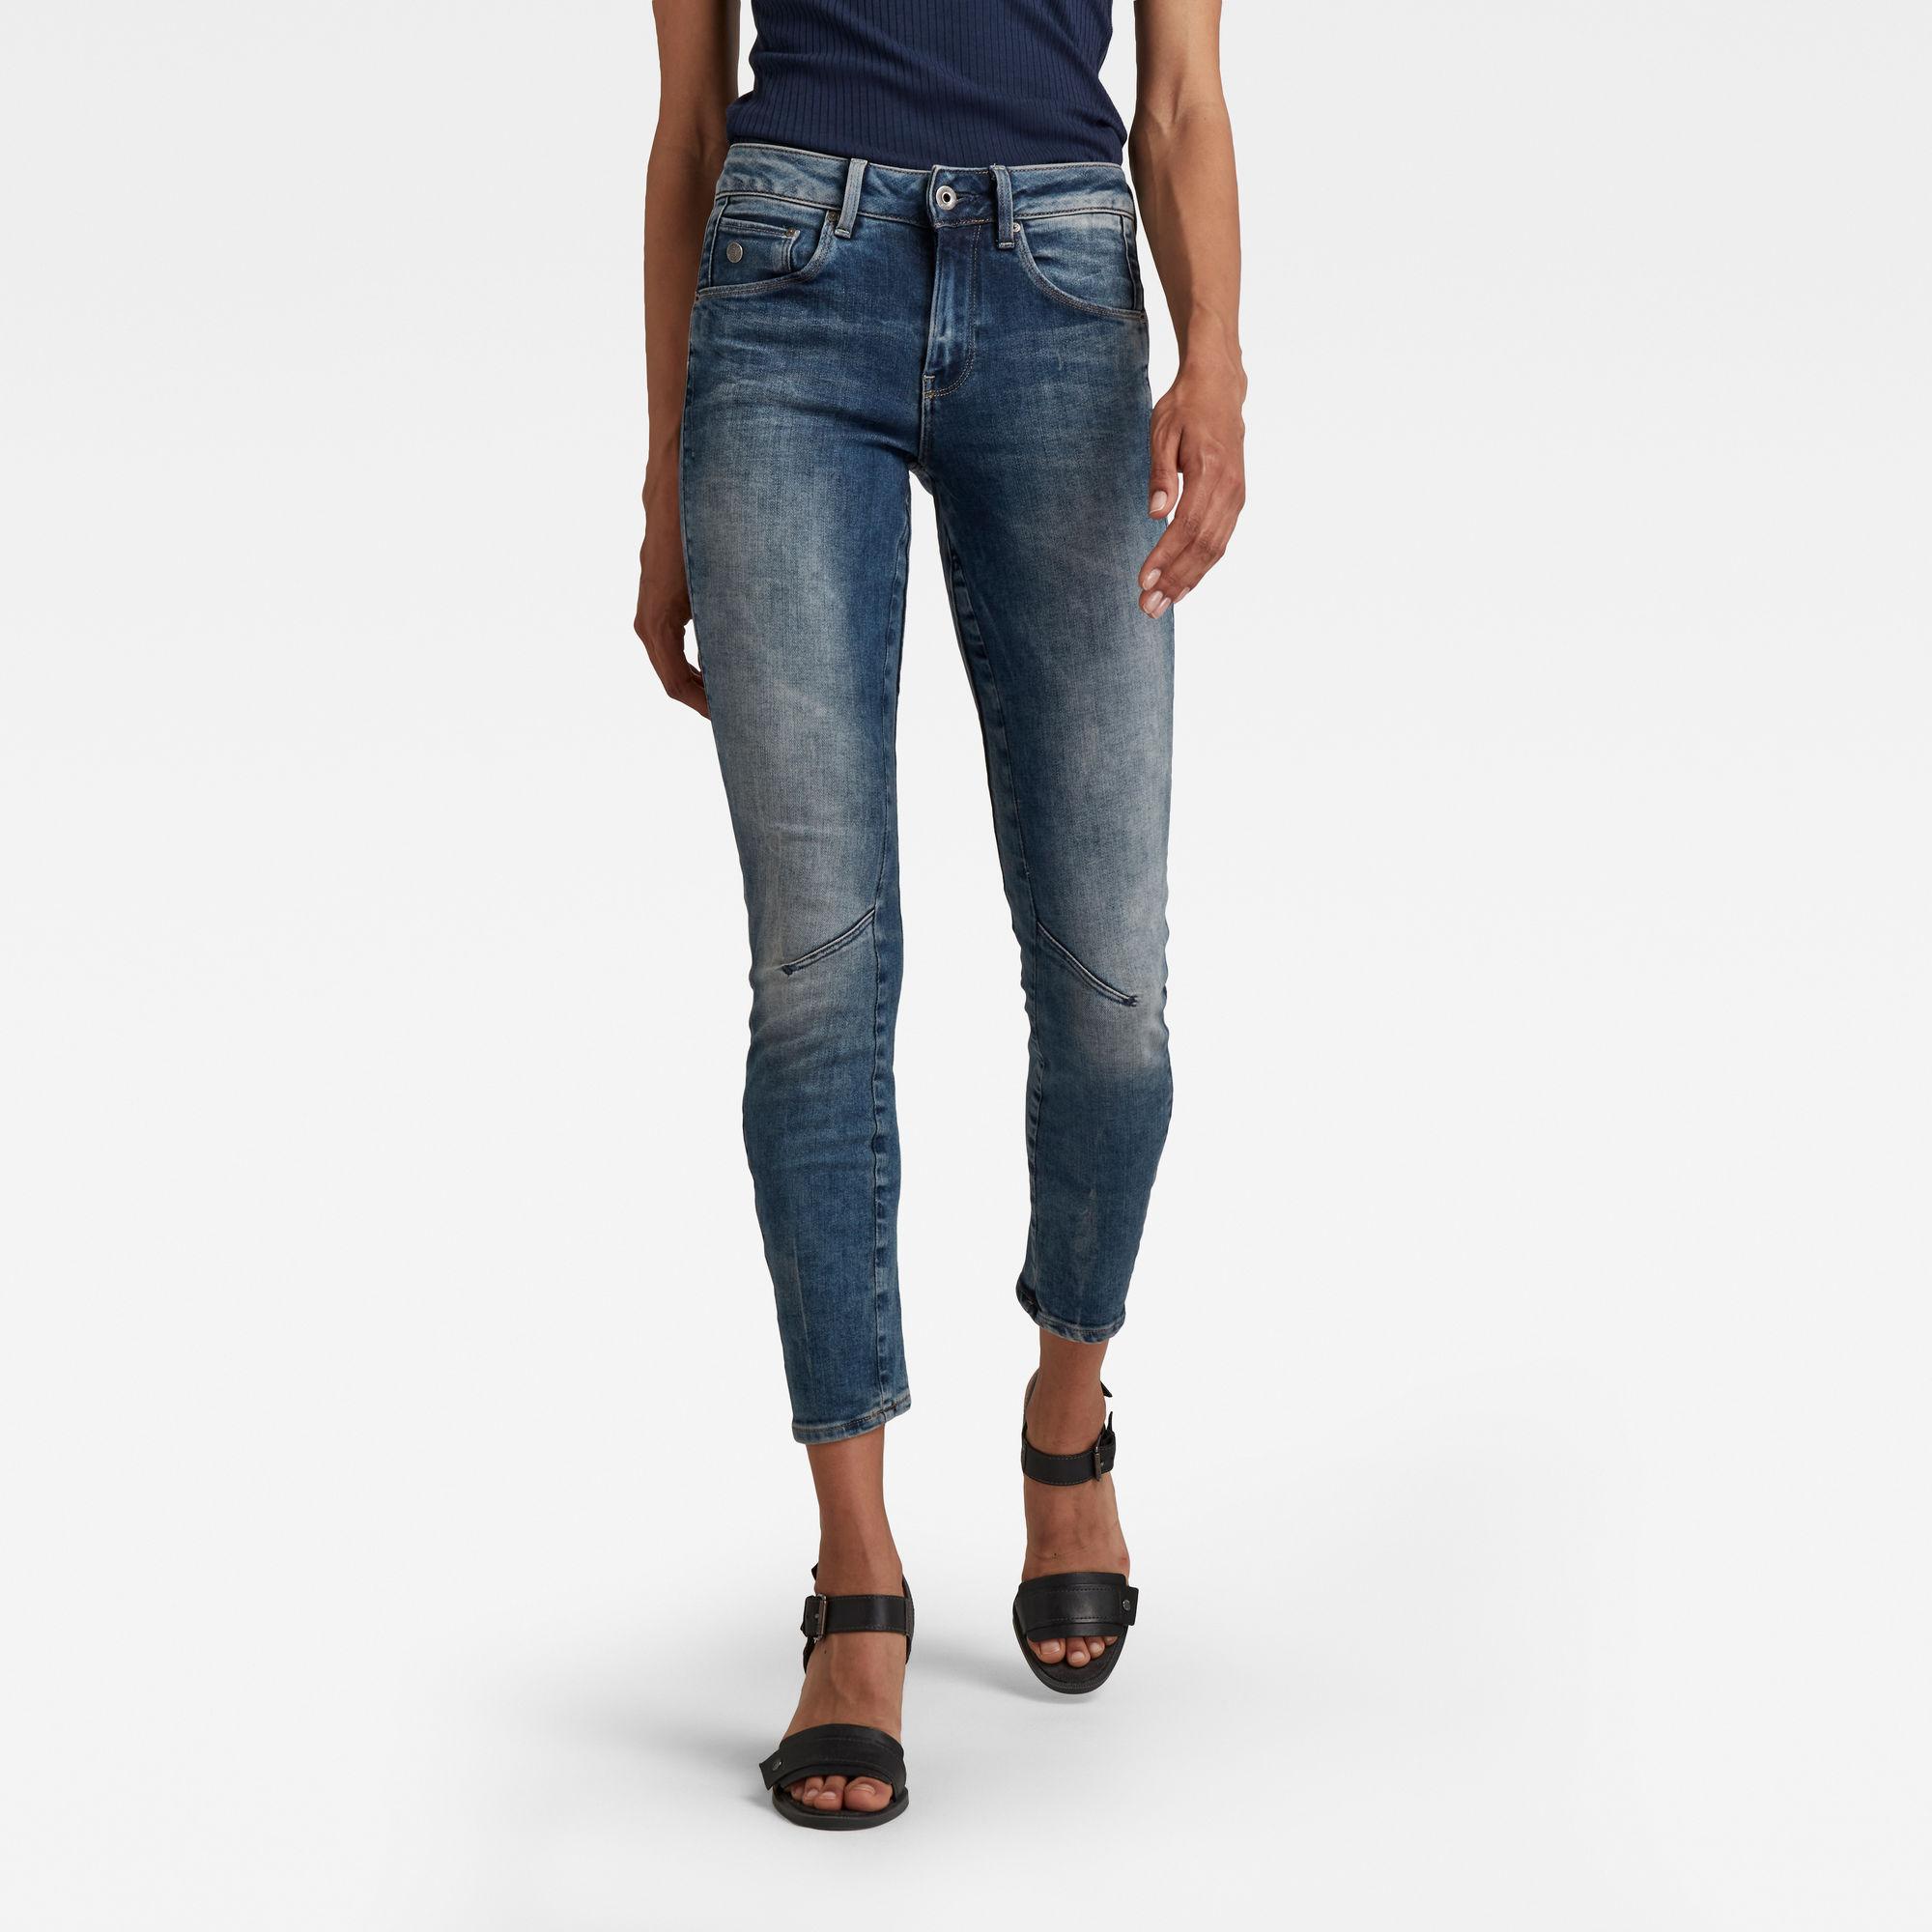 G-Star RAW Dames Arc 3D Mid Waist Skinny Jeans Blauw